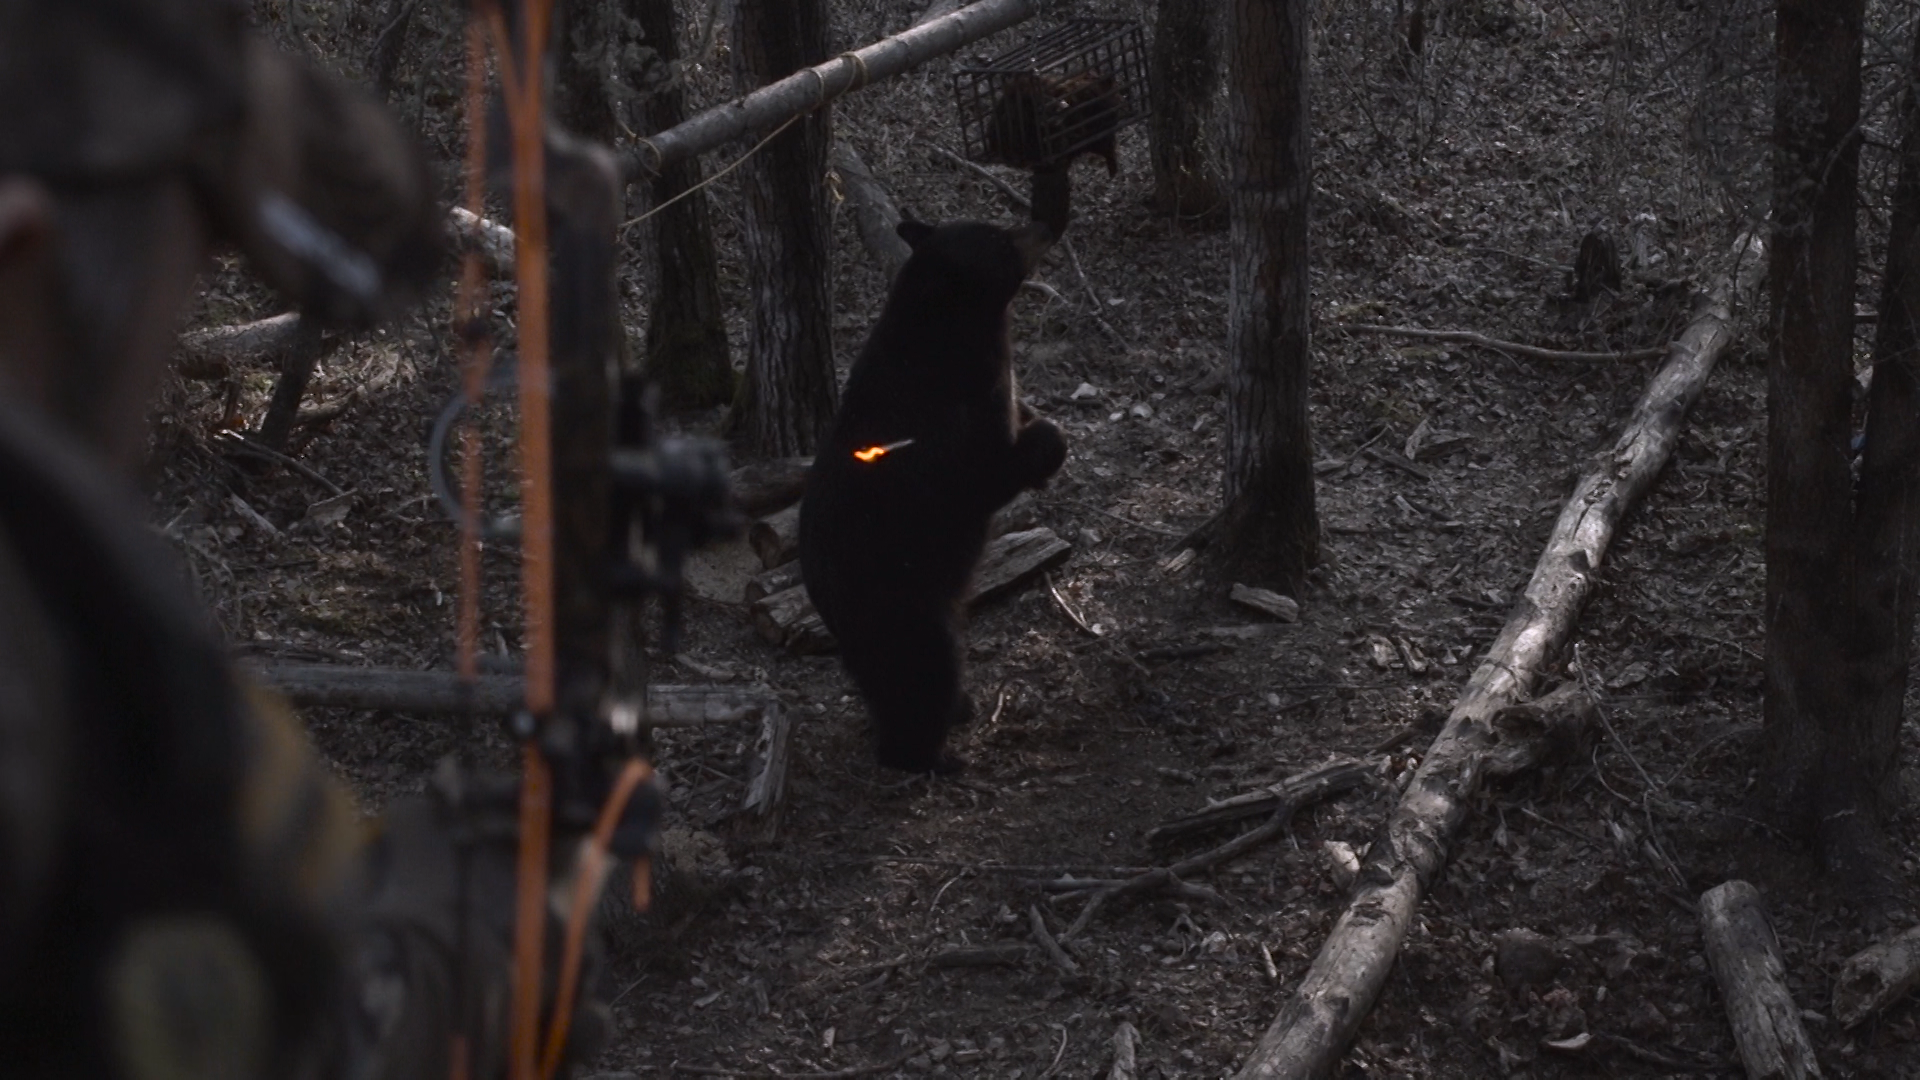 BBIL bear